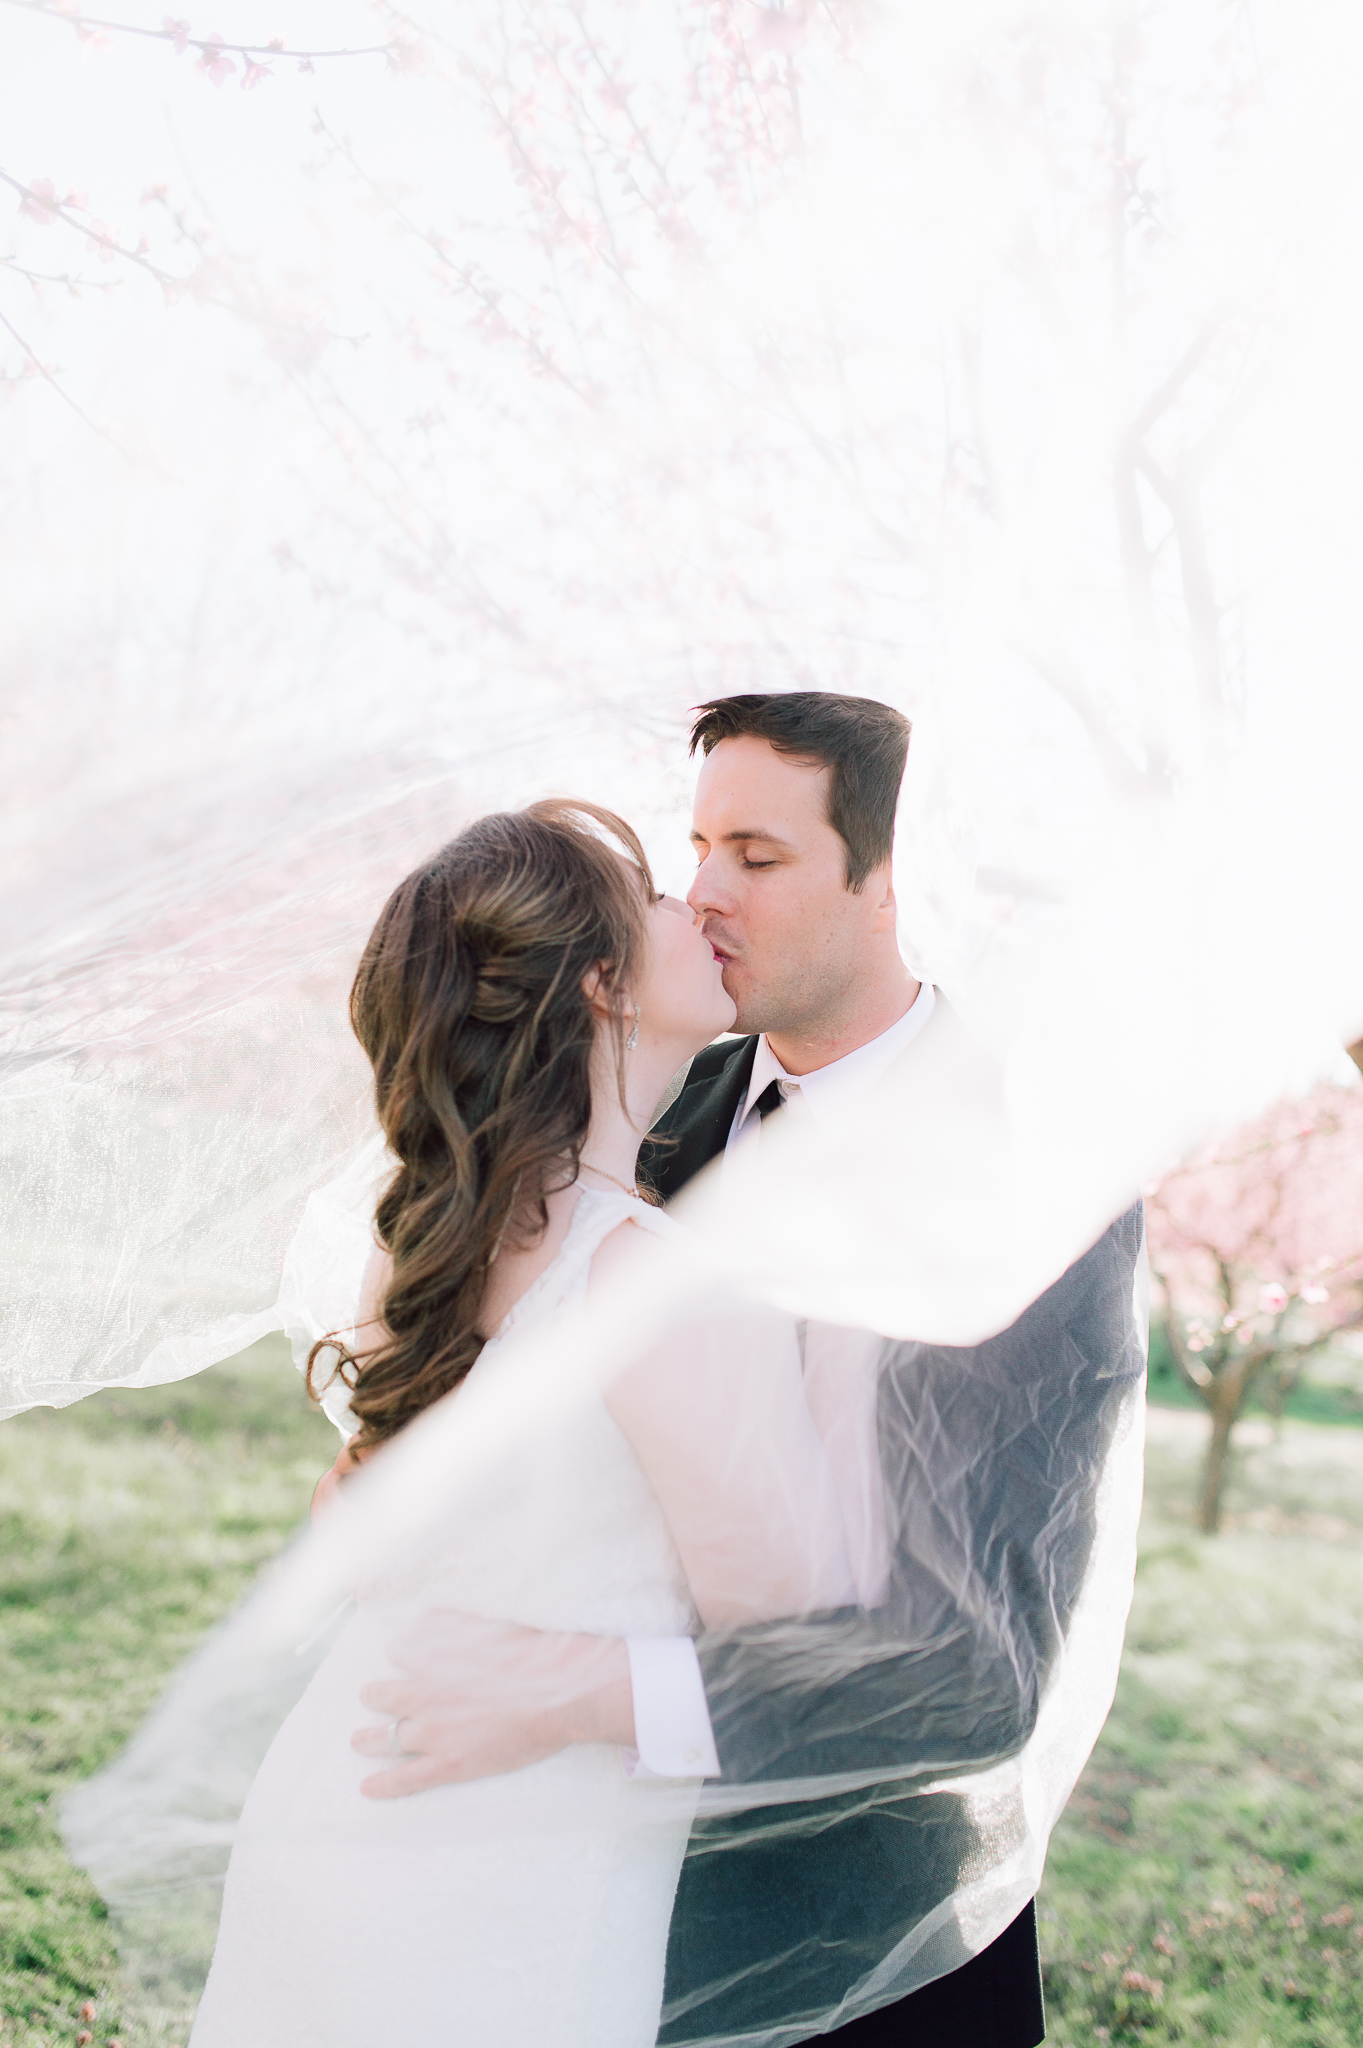 springwedding_cherryblossoms_virginiaphotographer_youseephotography_styledshoot (610).jpg